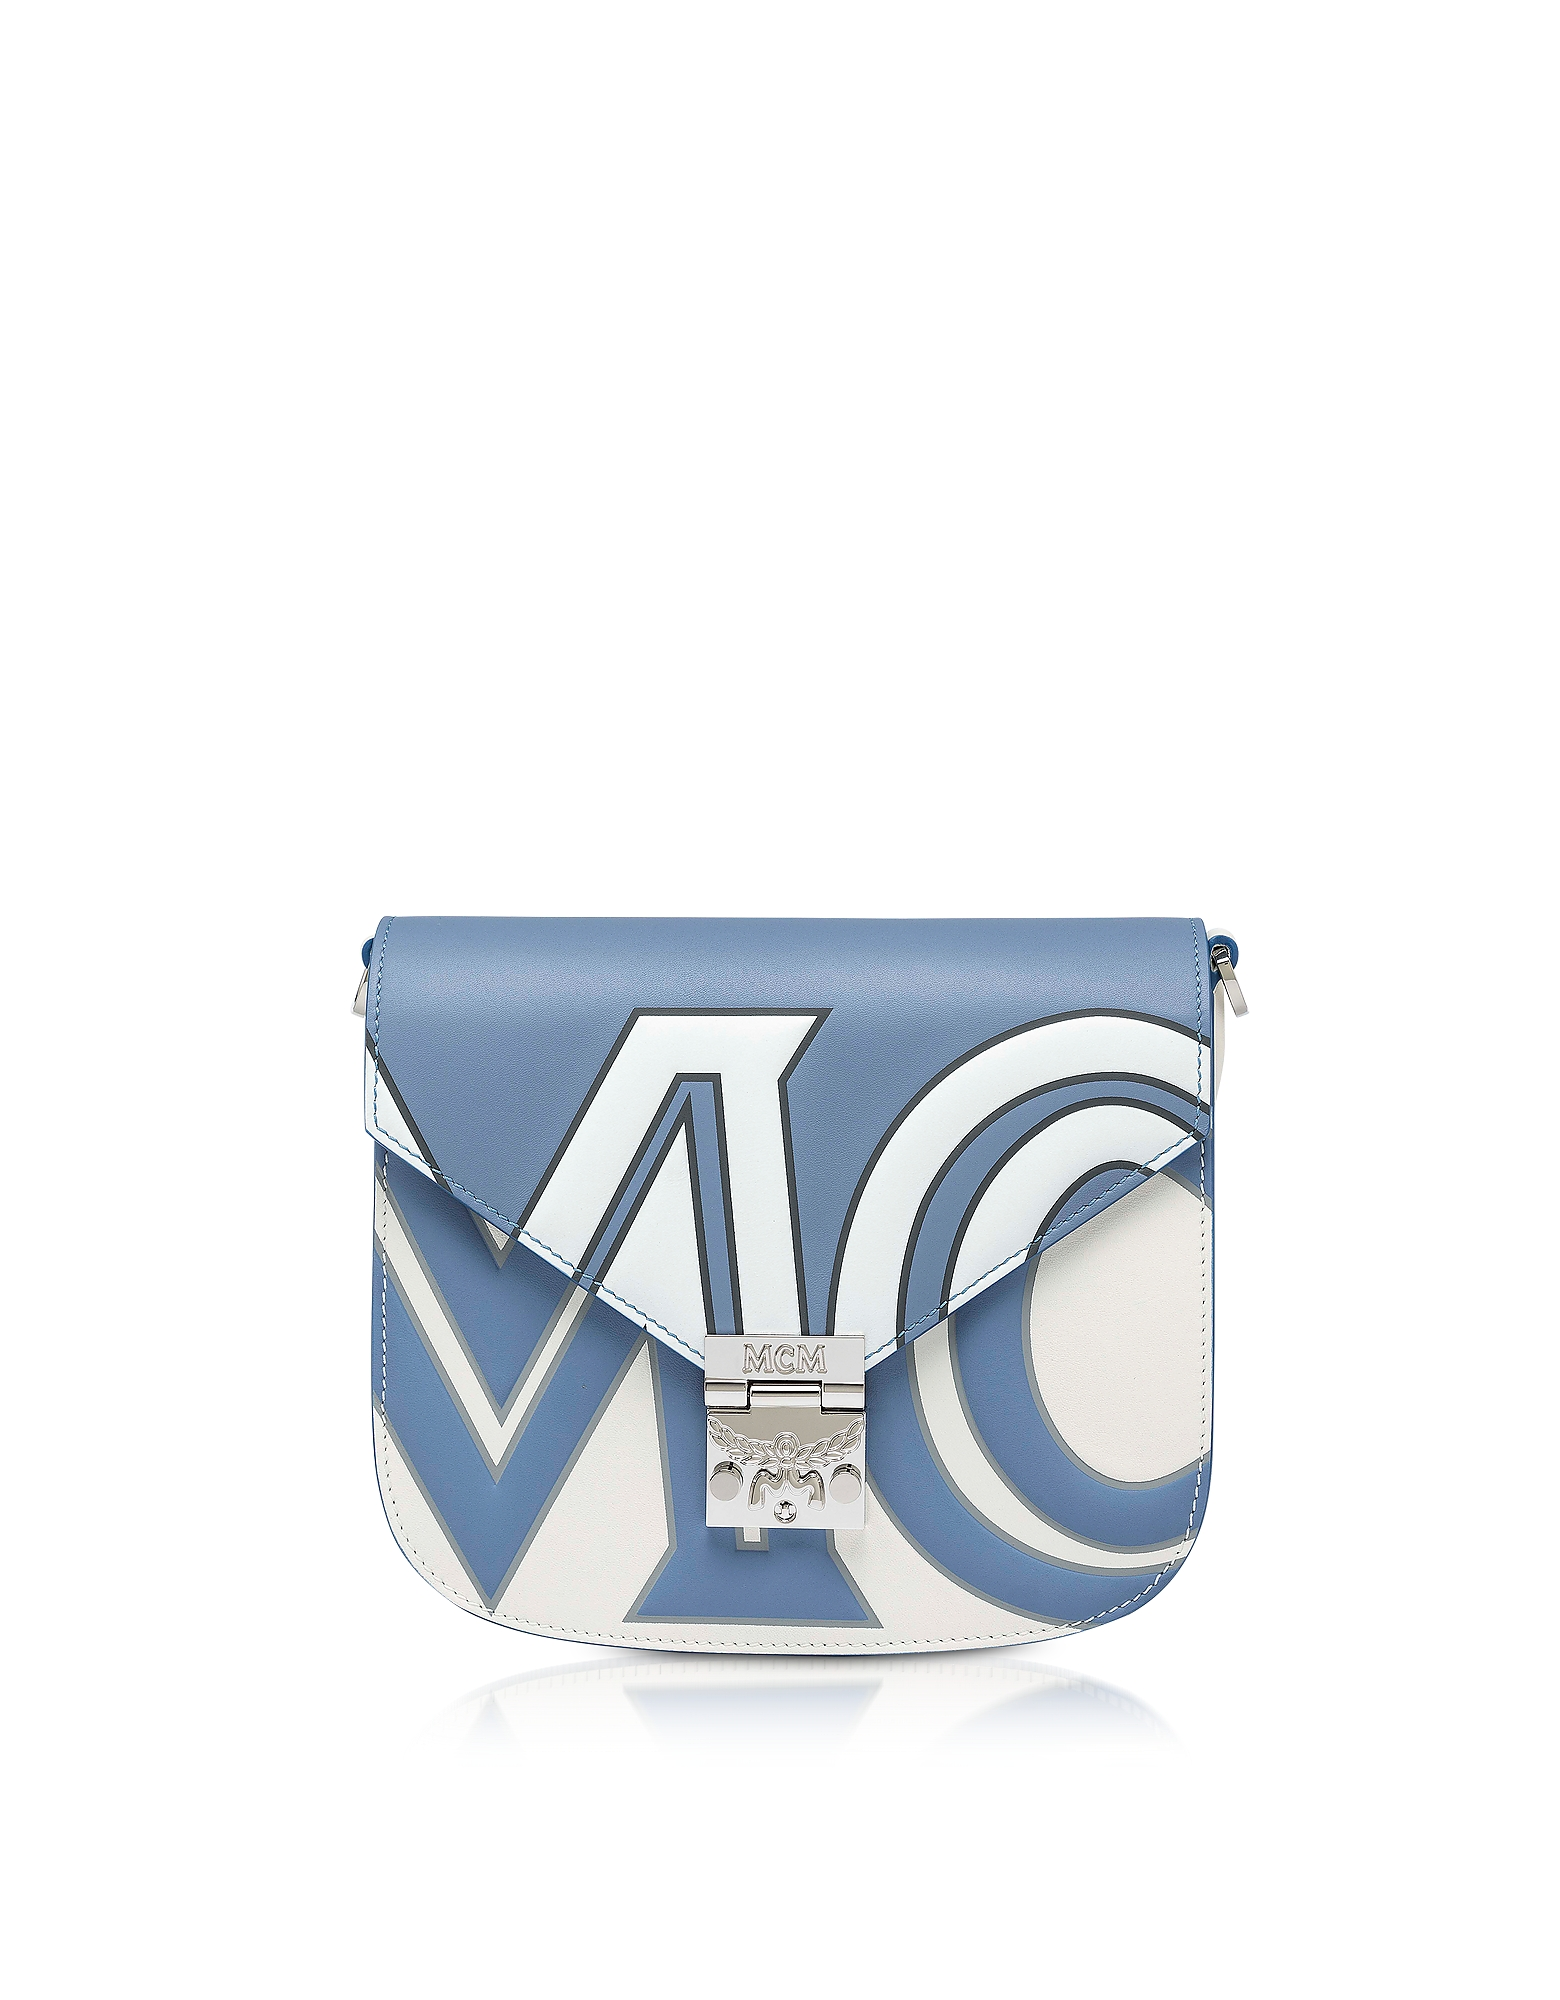 MCM Designer Handbags, Small Patricia Contrast Logo Shoulder Bag